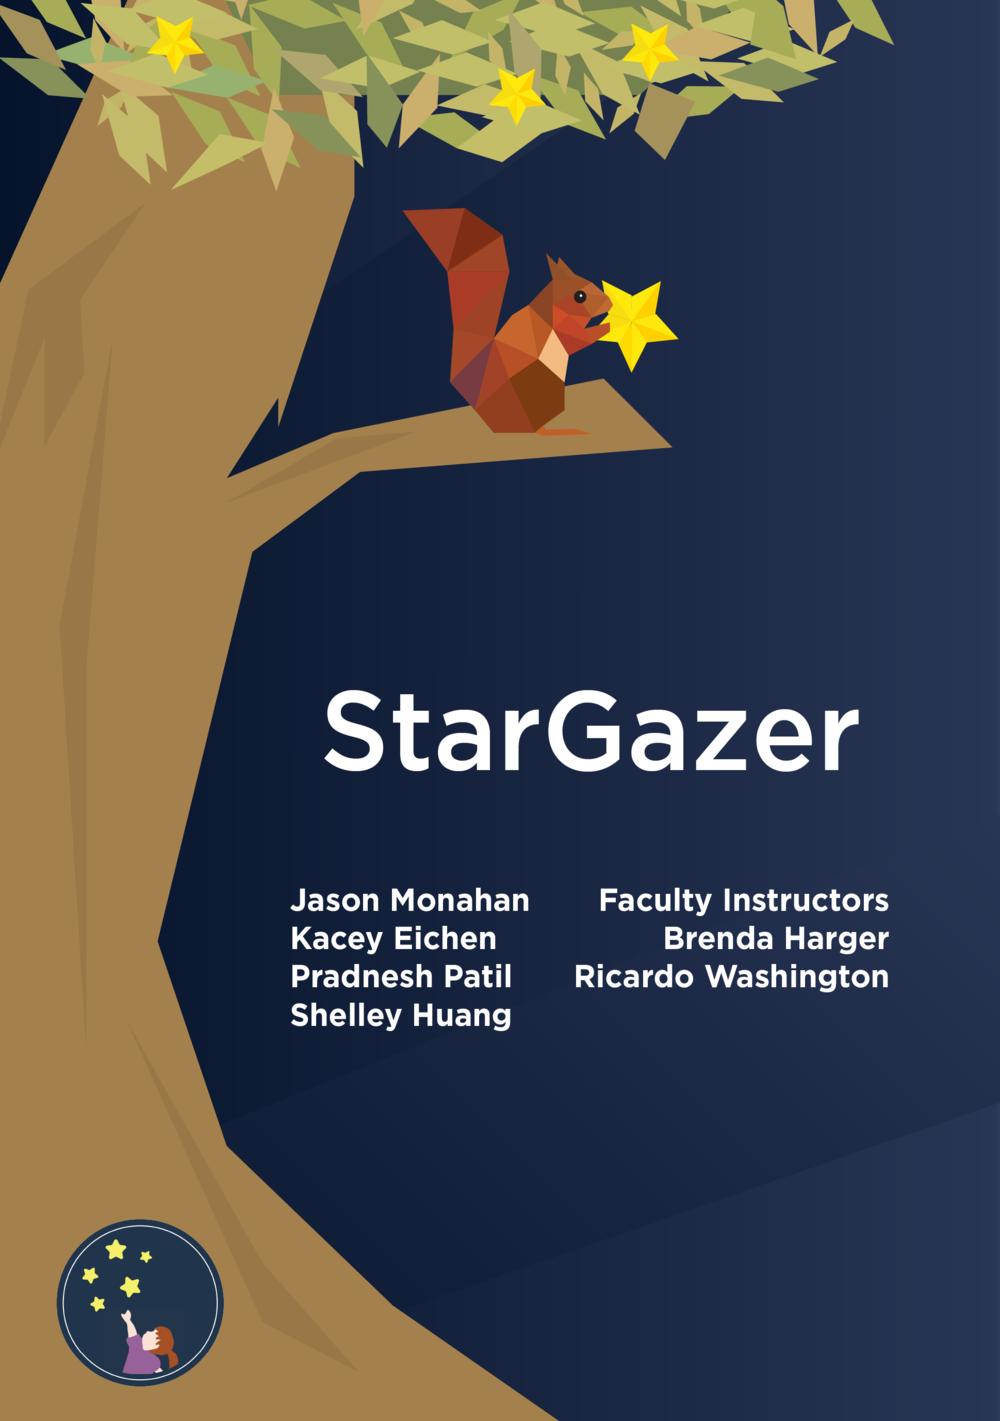 stargazer poster.png